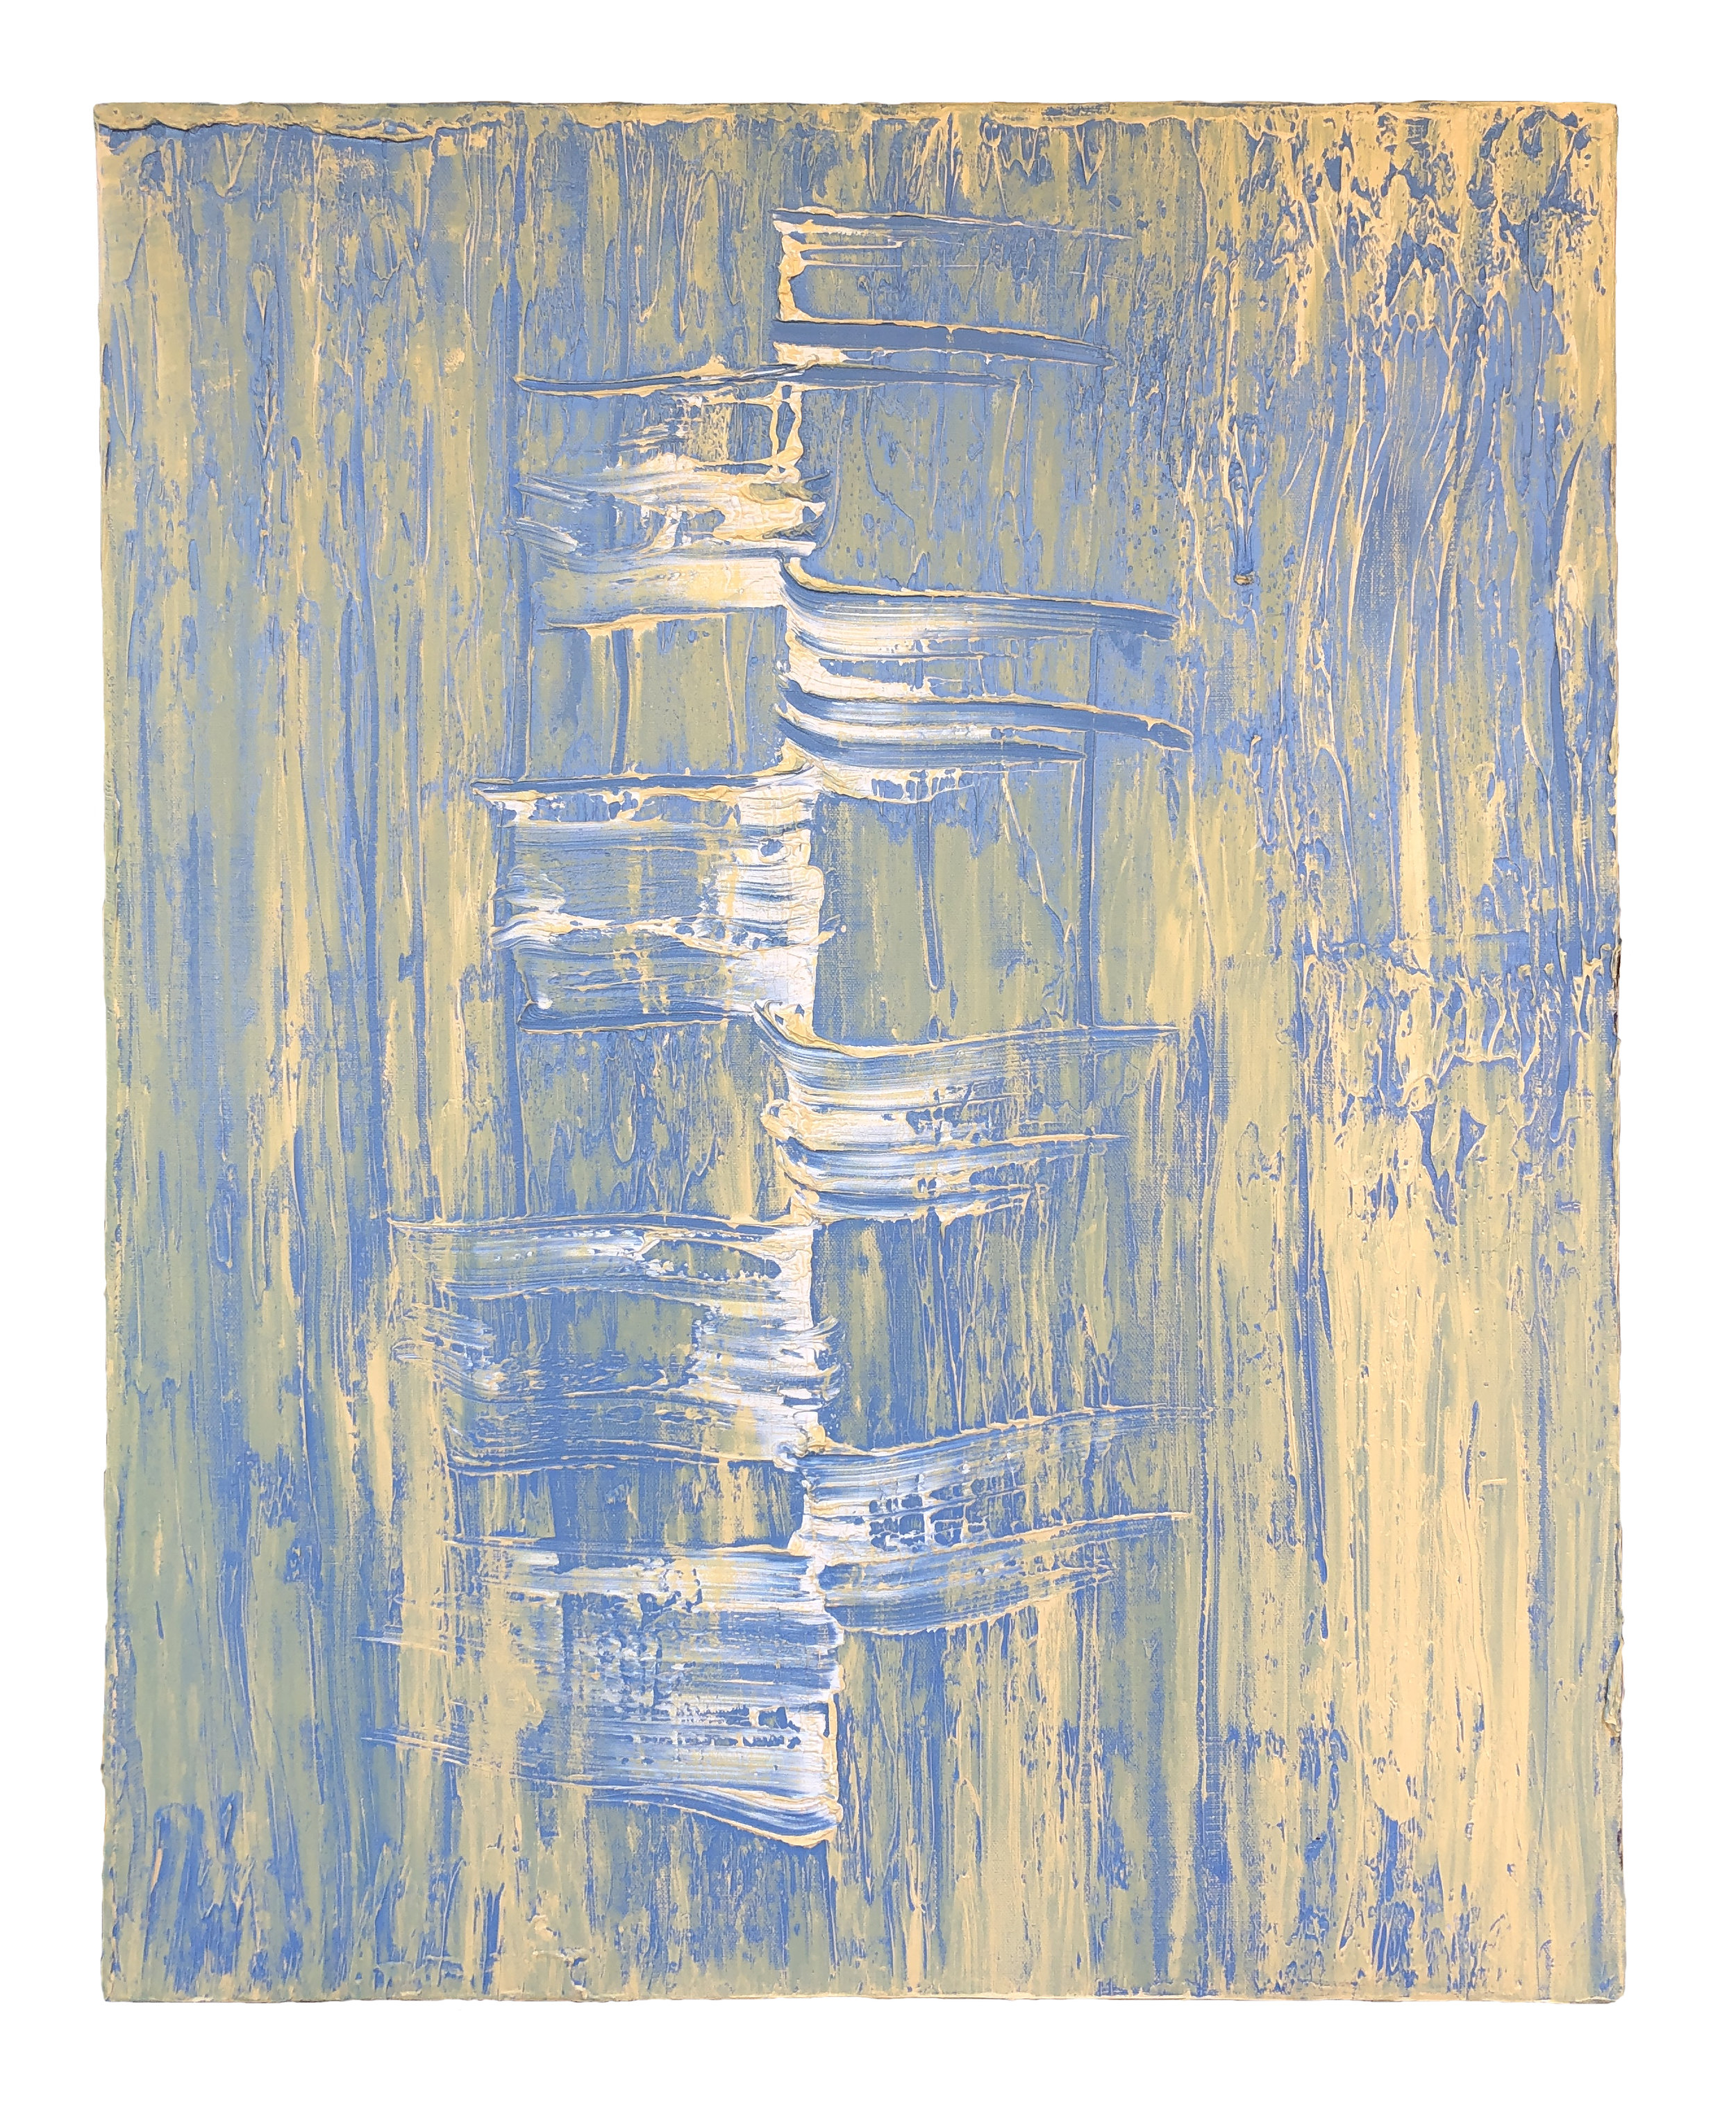 Aquine  , 2018  Oil on canvas  30 x 24 inches